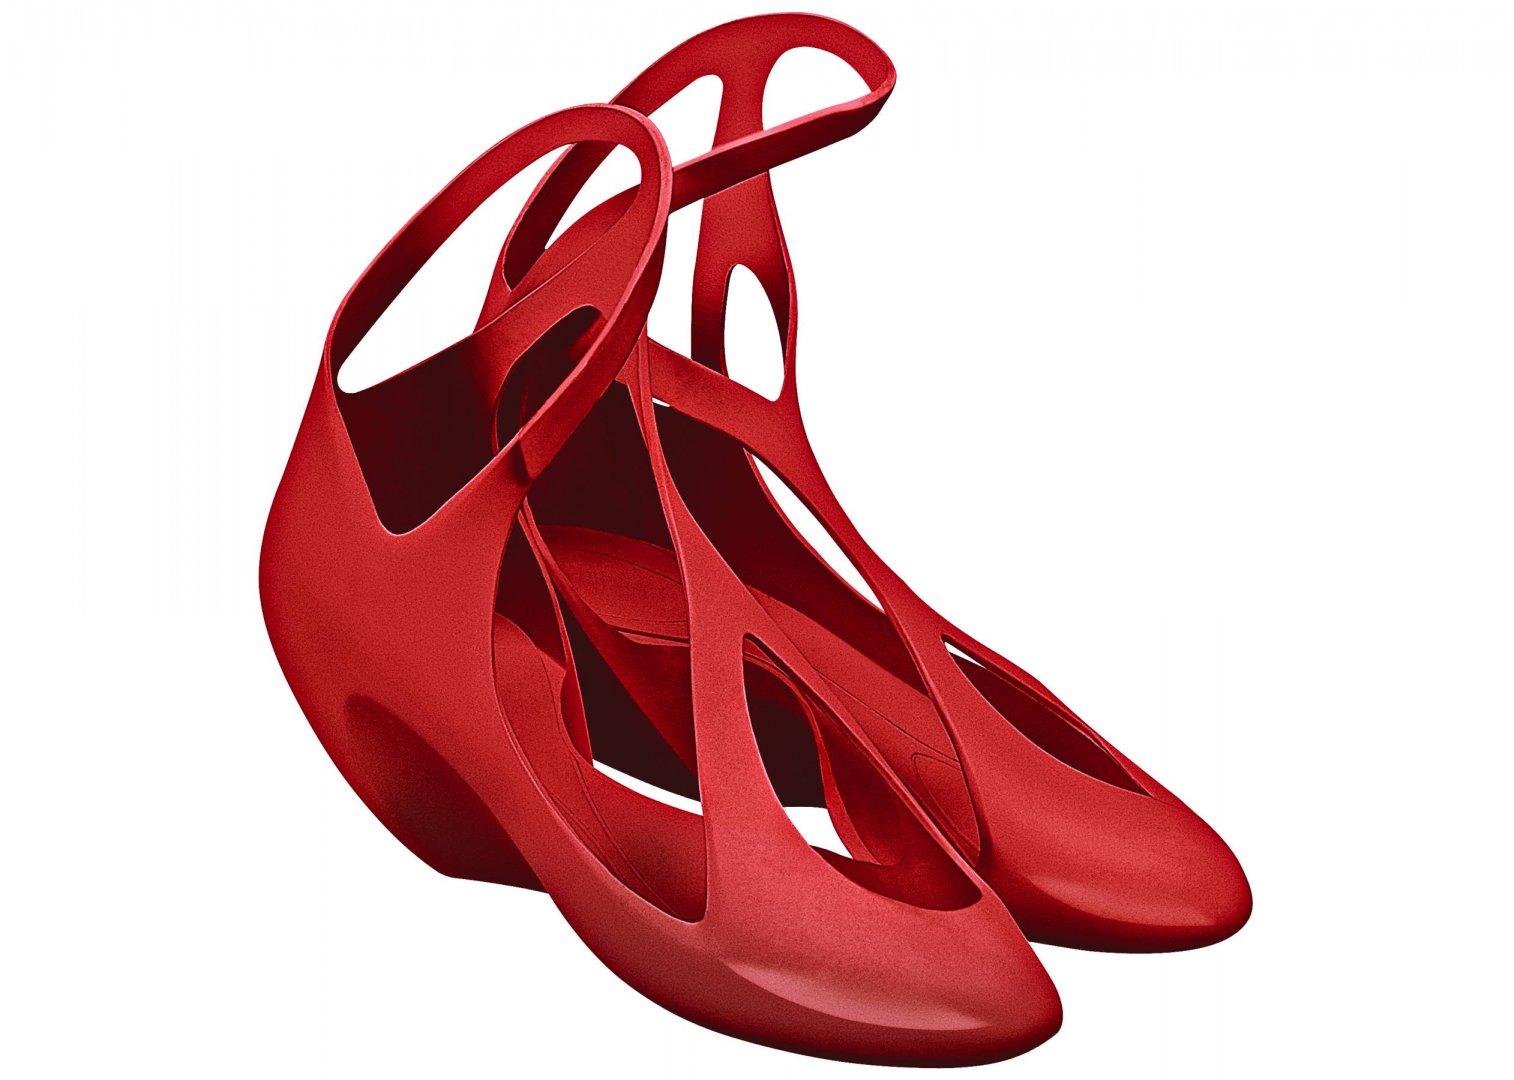 Zaha hadid Melissa shoes 3